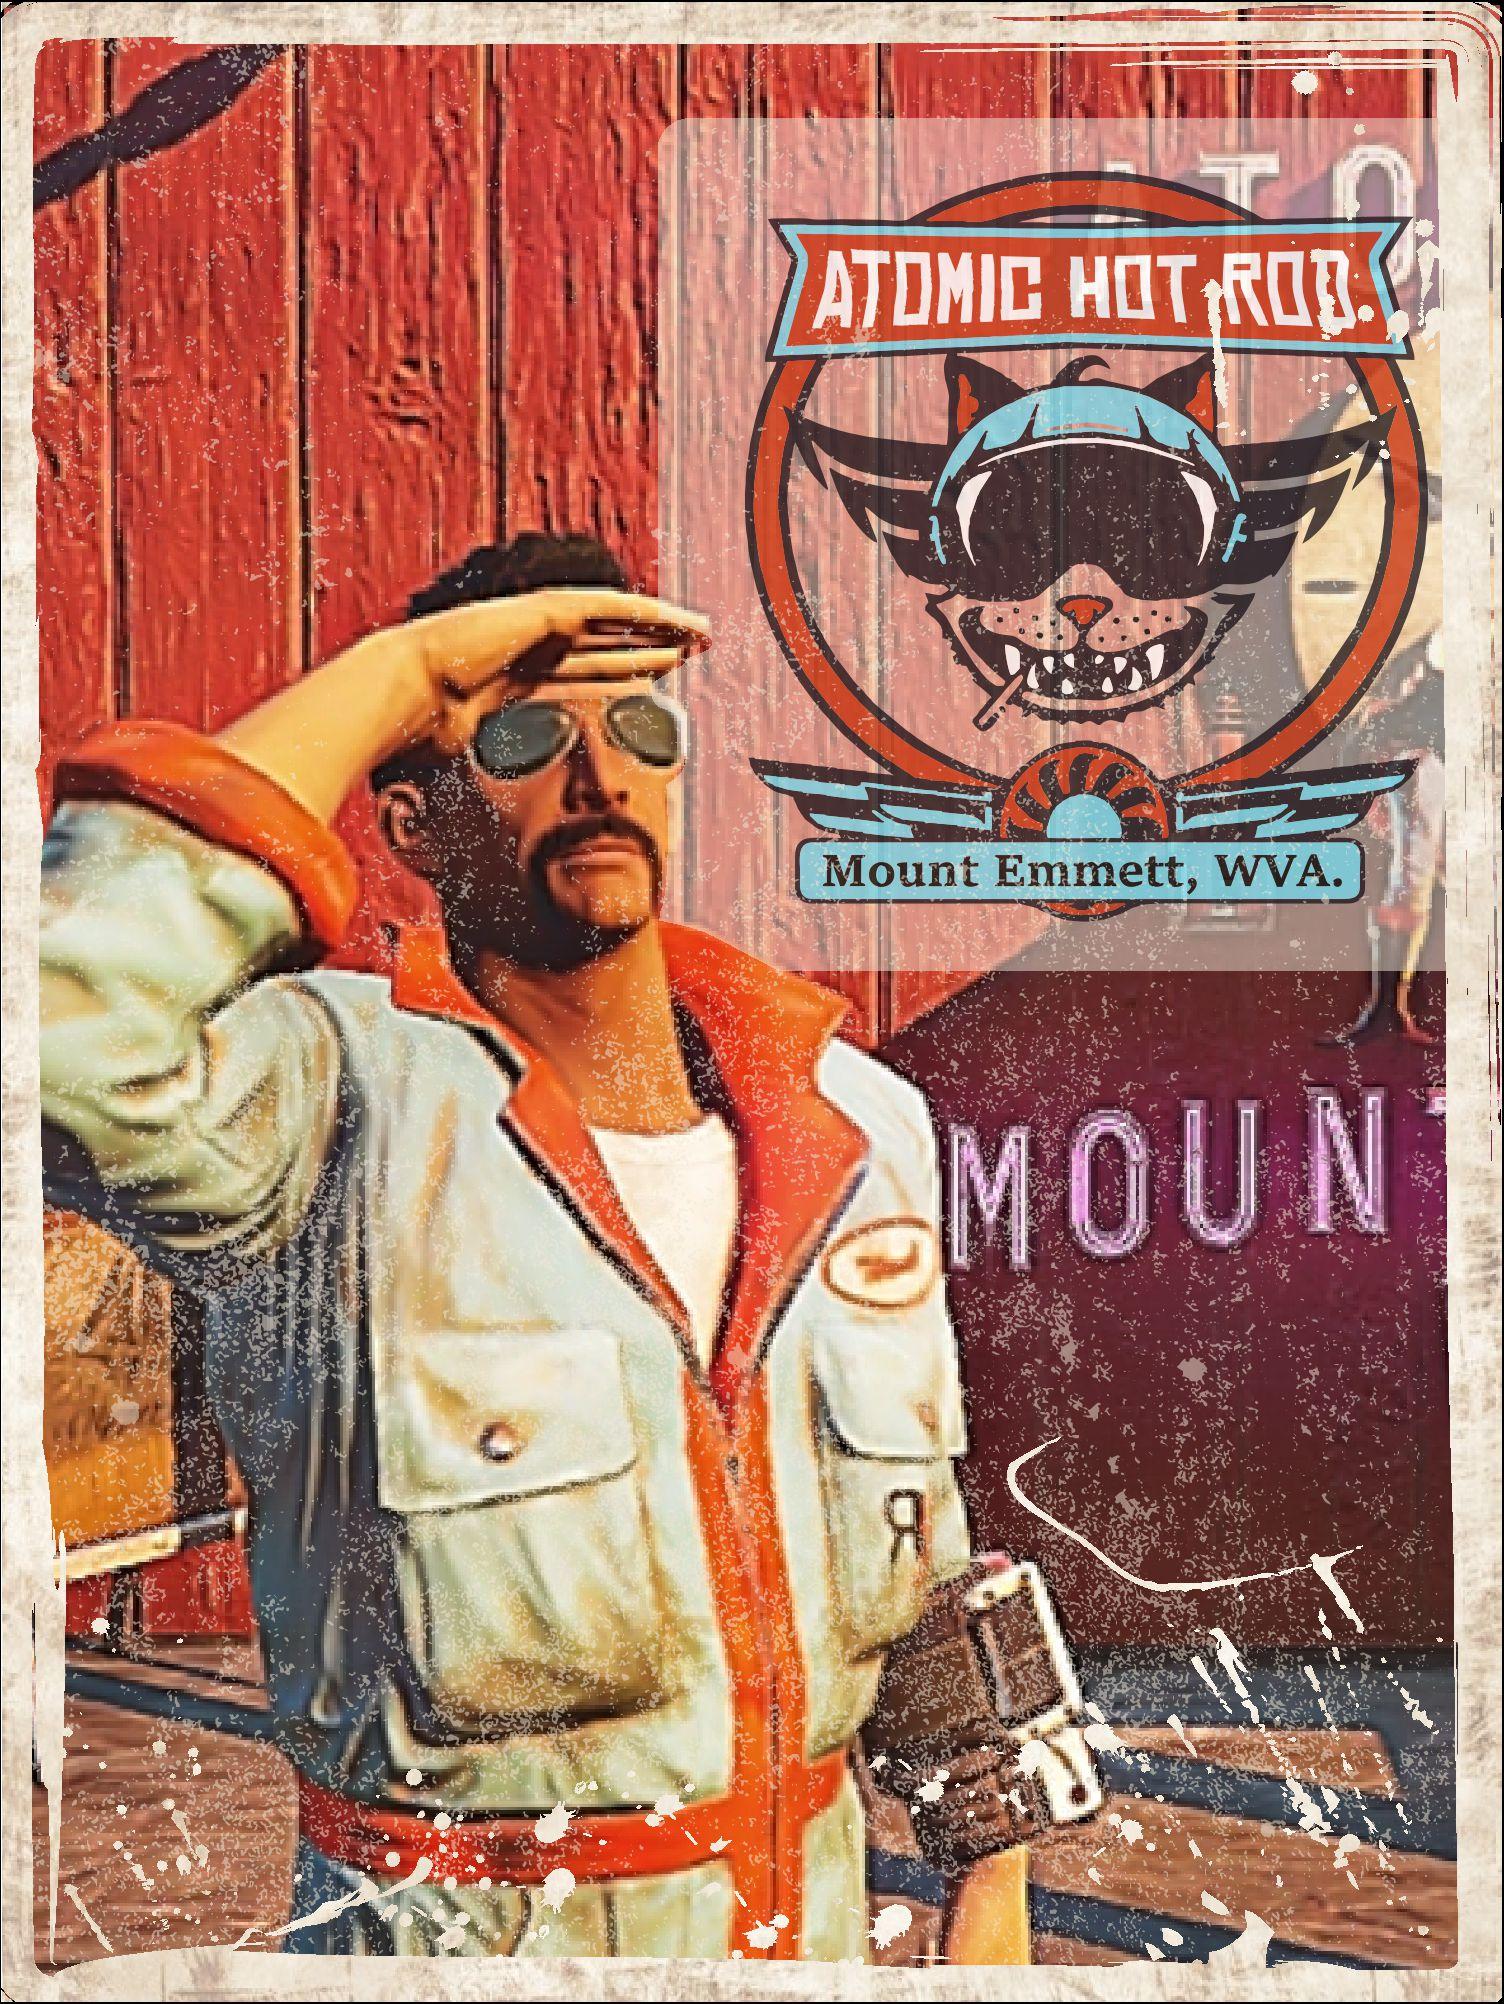 Atomic Hot Rod